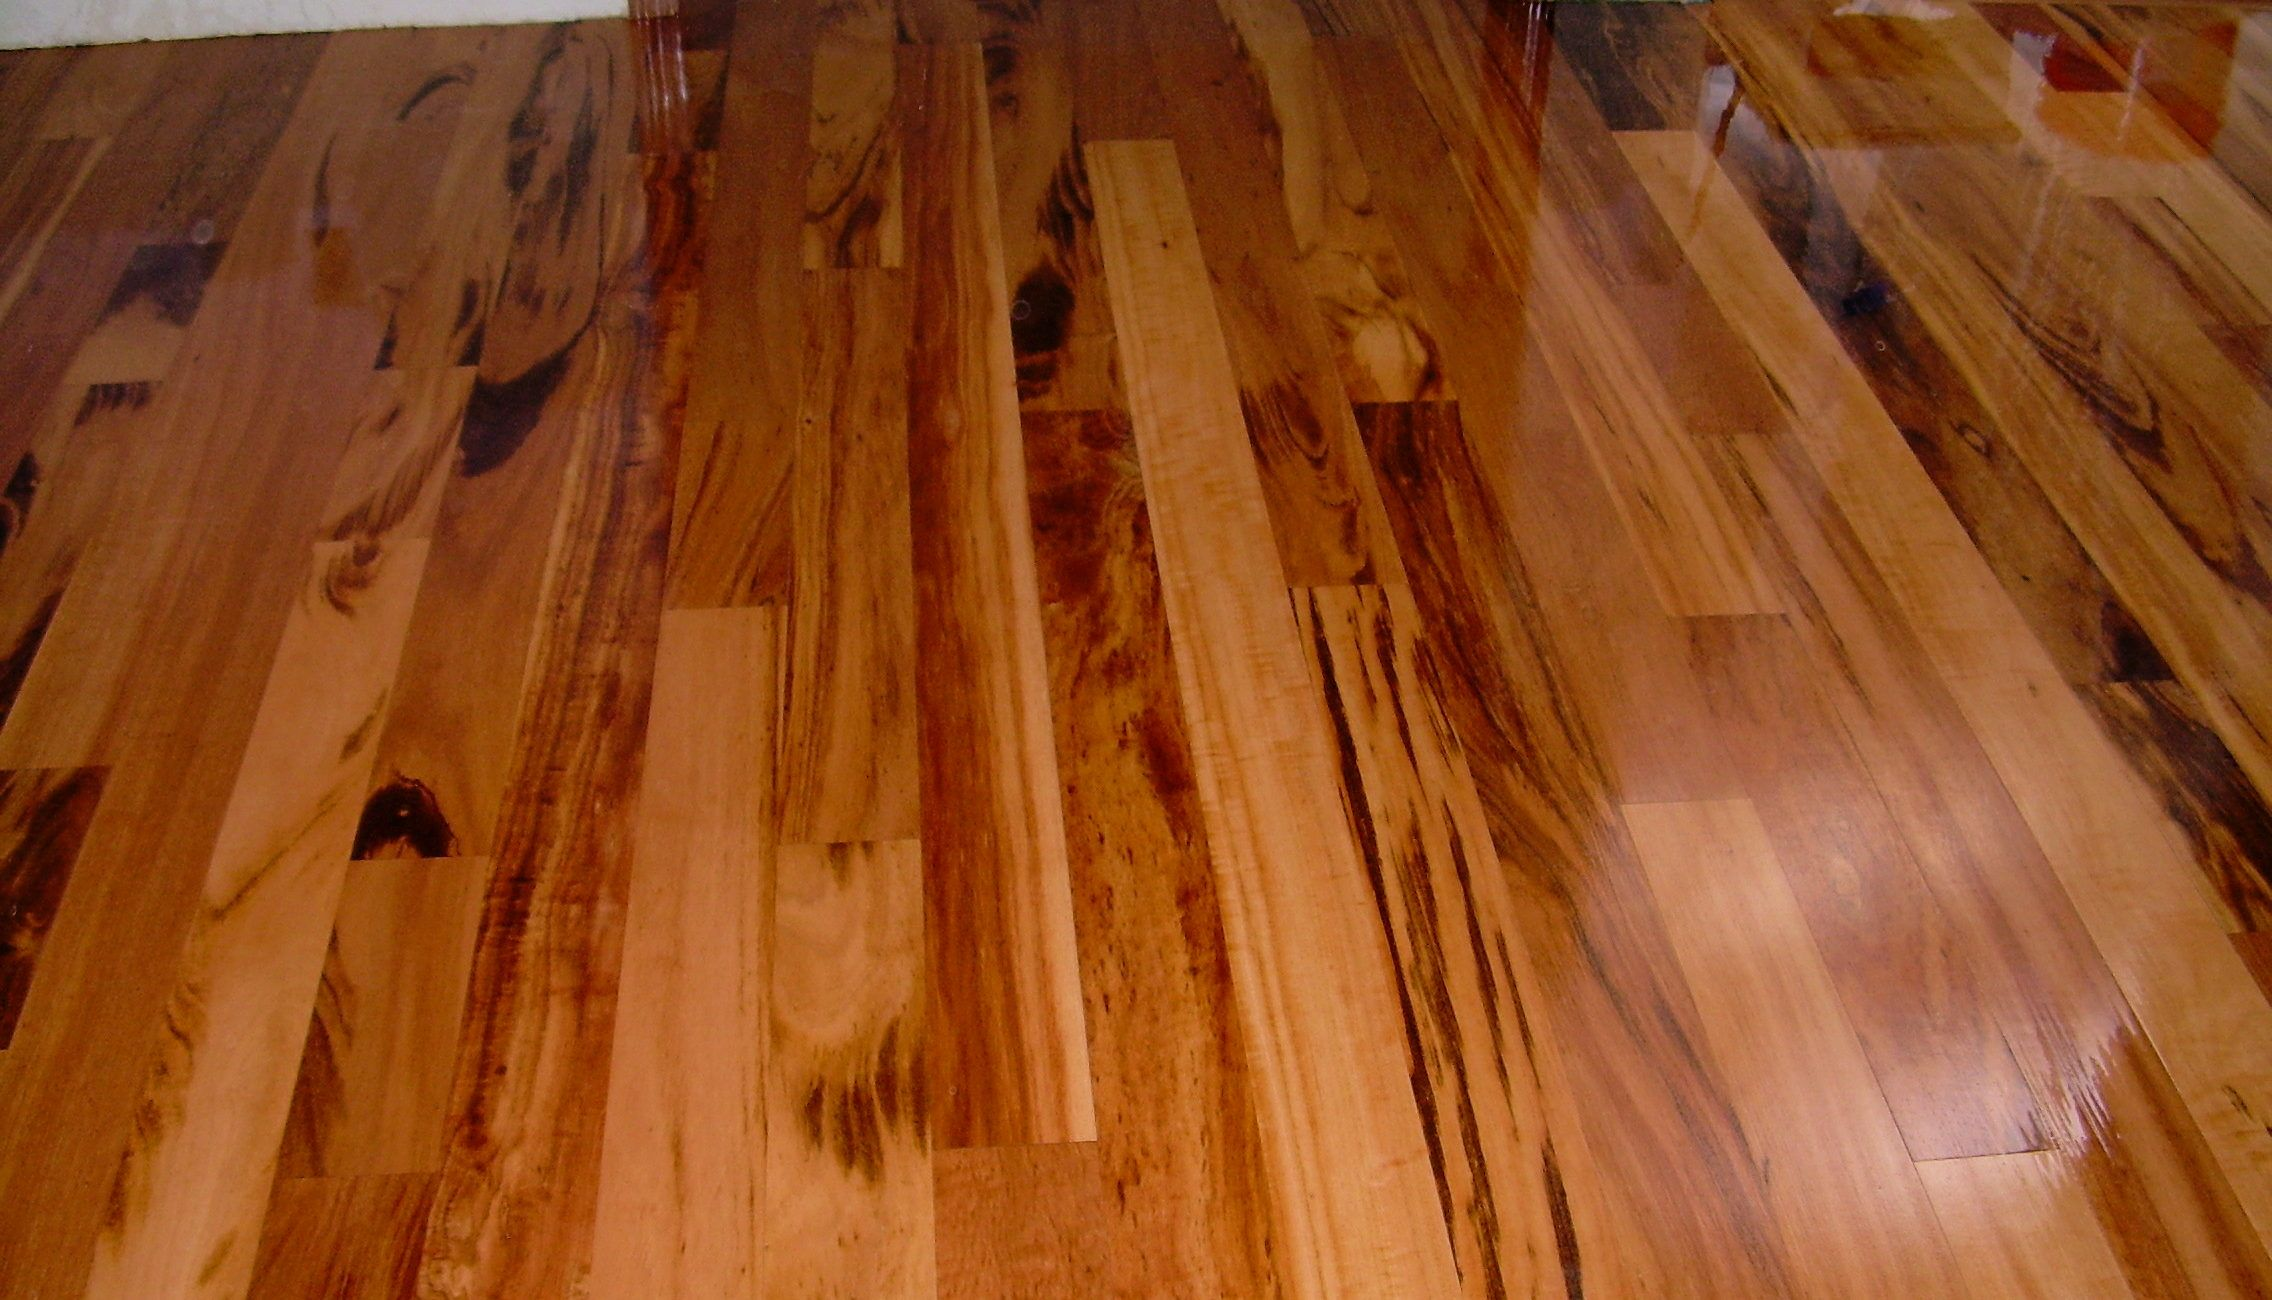 Brazilian Koa Tigerwood The Flooring Blog Tigerwood Flooring Hardwood Floors Hardwood